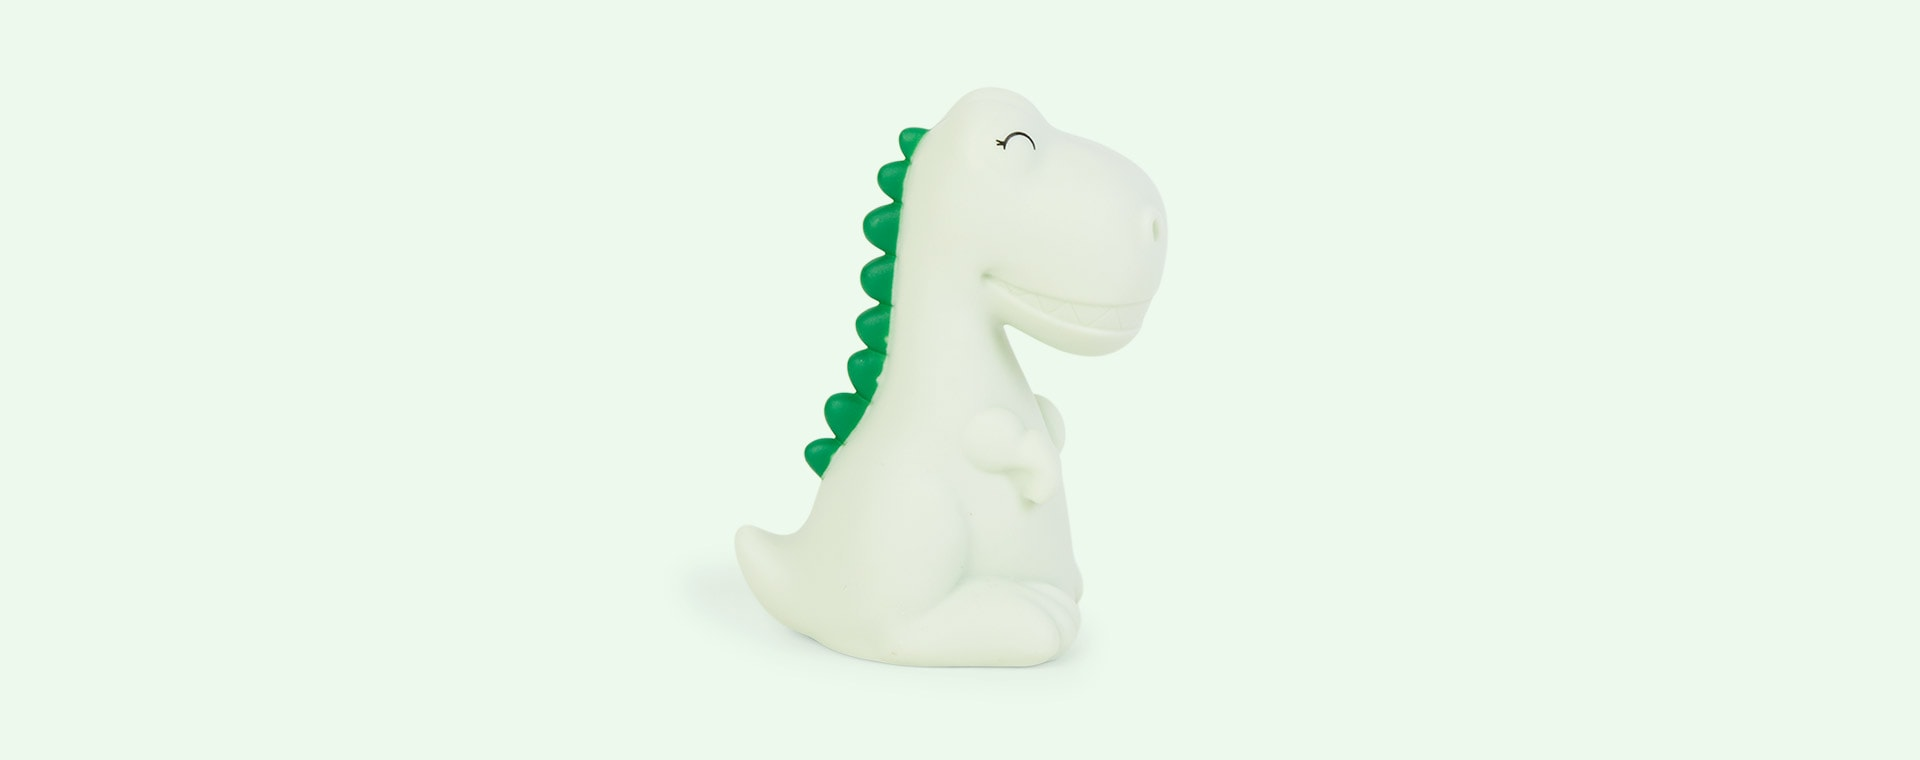 Green Dino With Dark Green Mane Dhink Mini LED Night Light